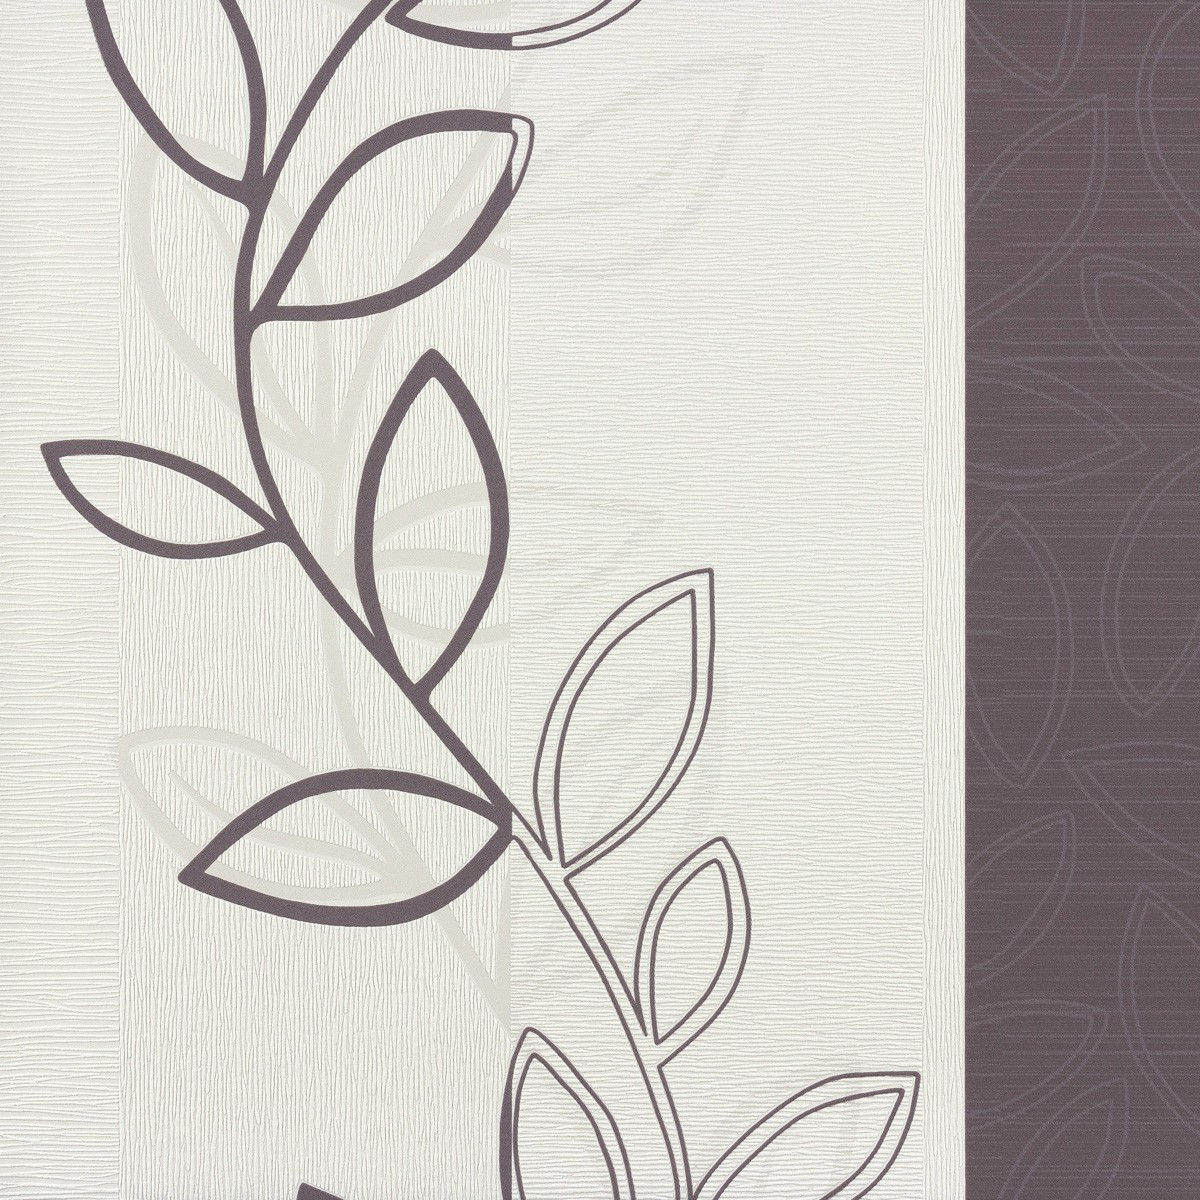 tapete endless joy rasch vliestapete 723557 streifen. Black Bedroom Furniture Sets. Home Design Ideas